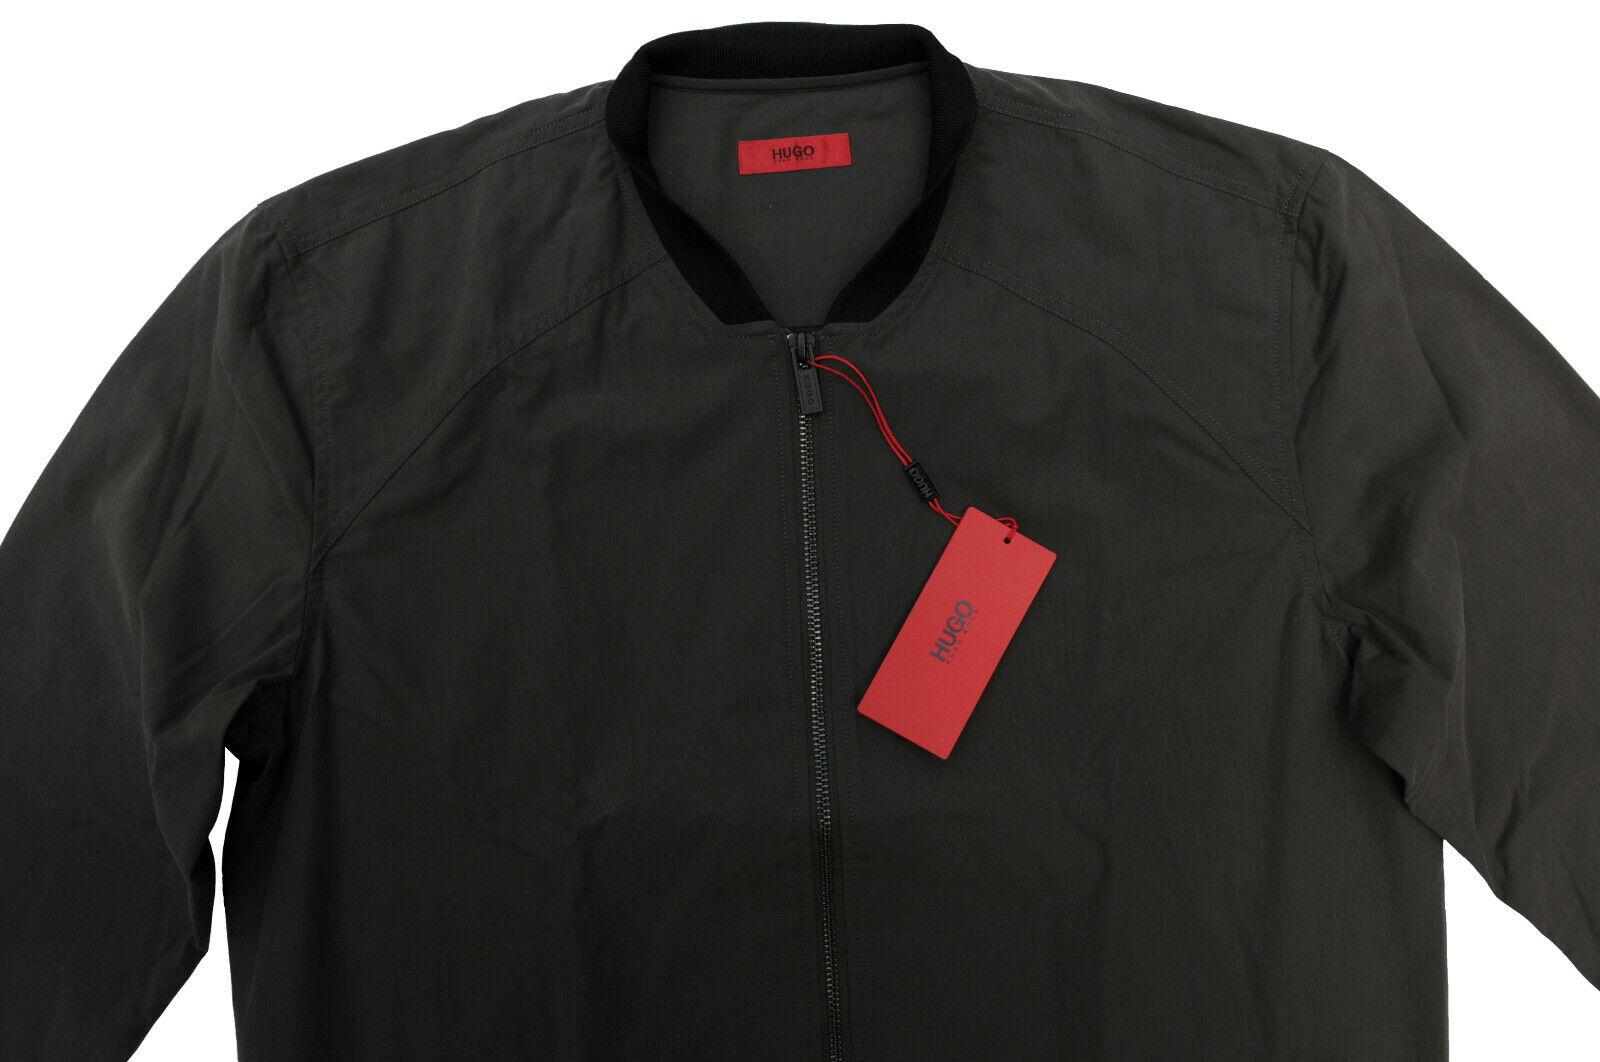 NUOVO TG. M Hugo Boss Giacca jemmerich dark-verde dark-verde dark-verde regular fit jeans a 50373510 789131